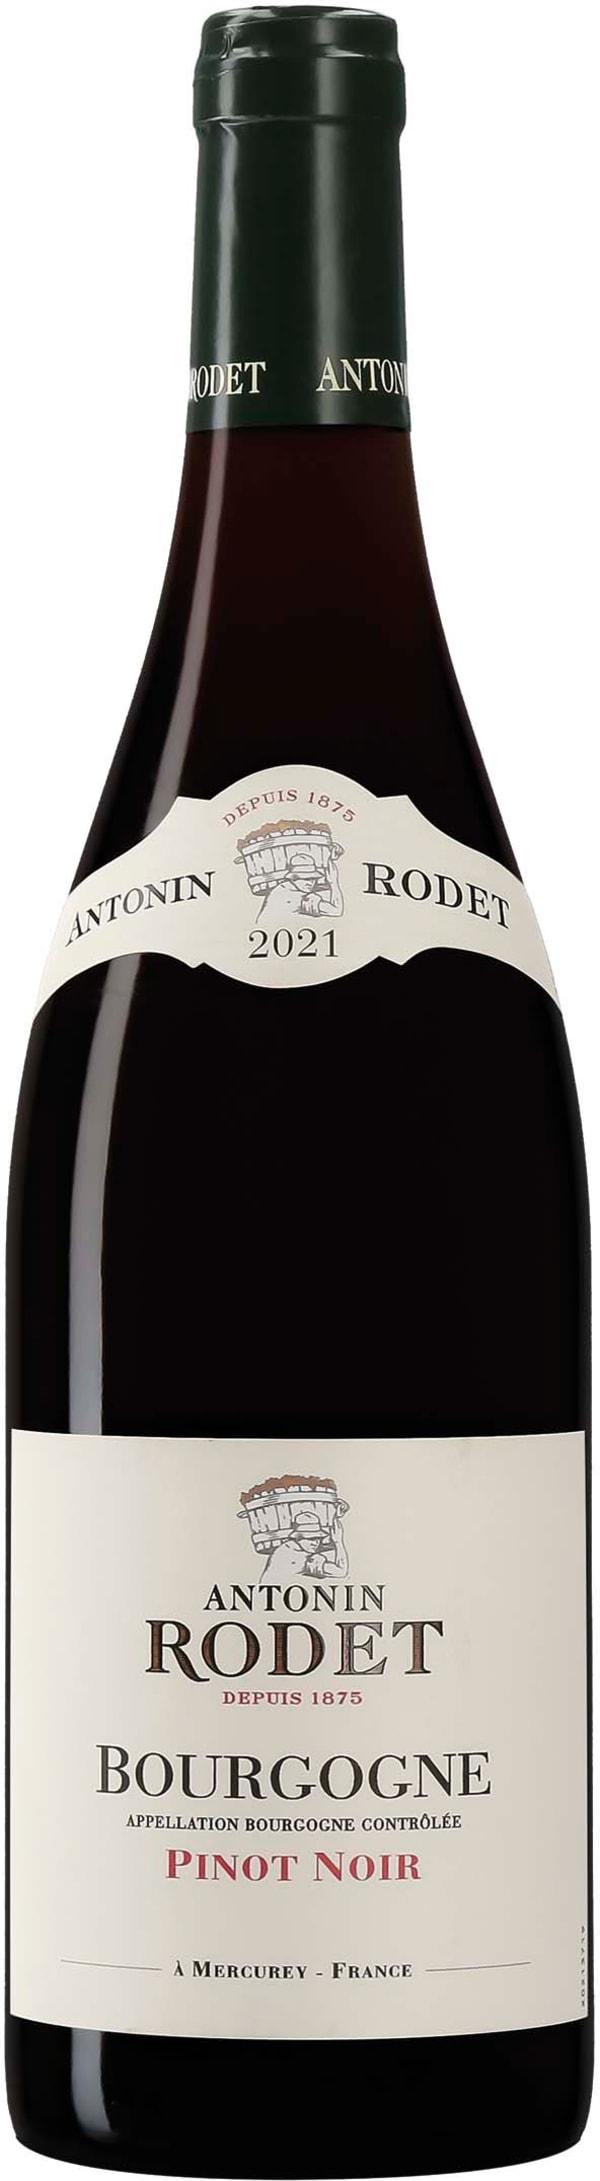 Antonin Rodet Pinot Noir 2018